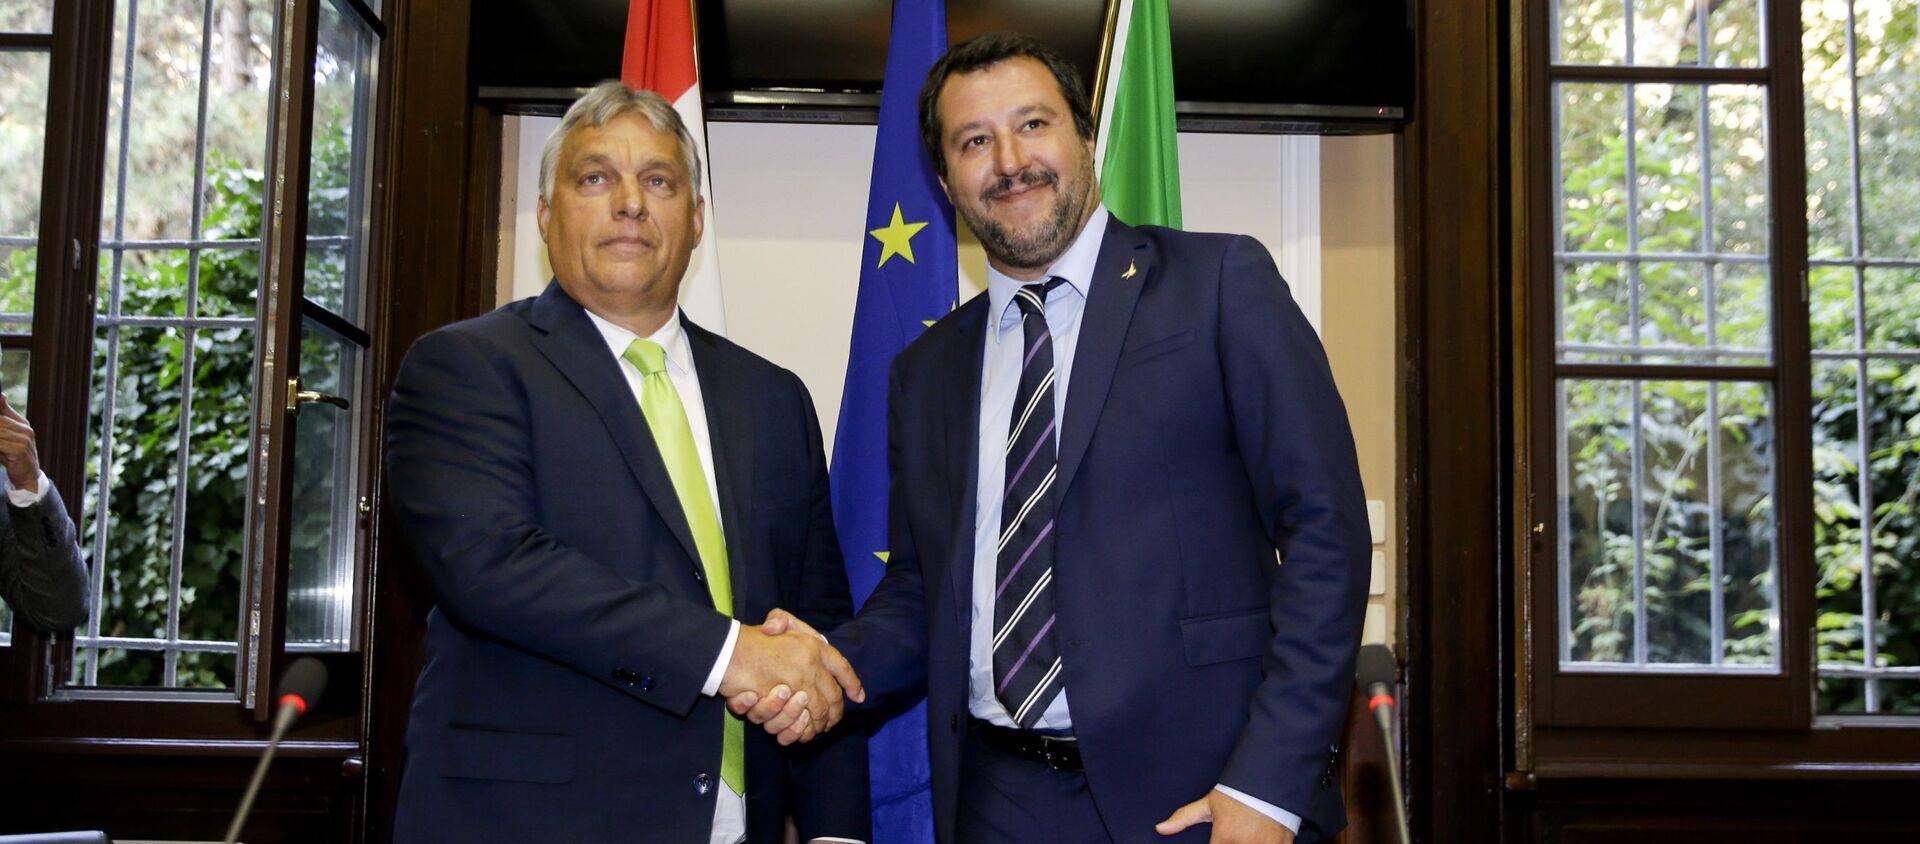 Viktor Orban i matteo Salvini - Sputnik Polska, 1920, 01.04.2021